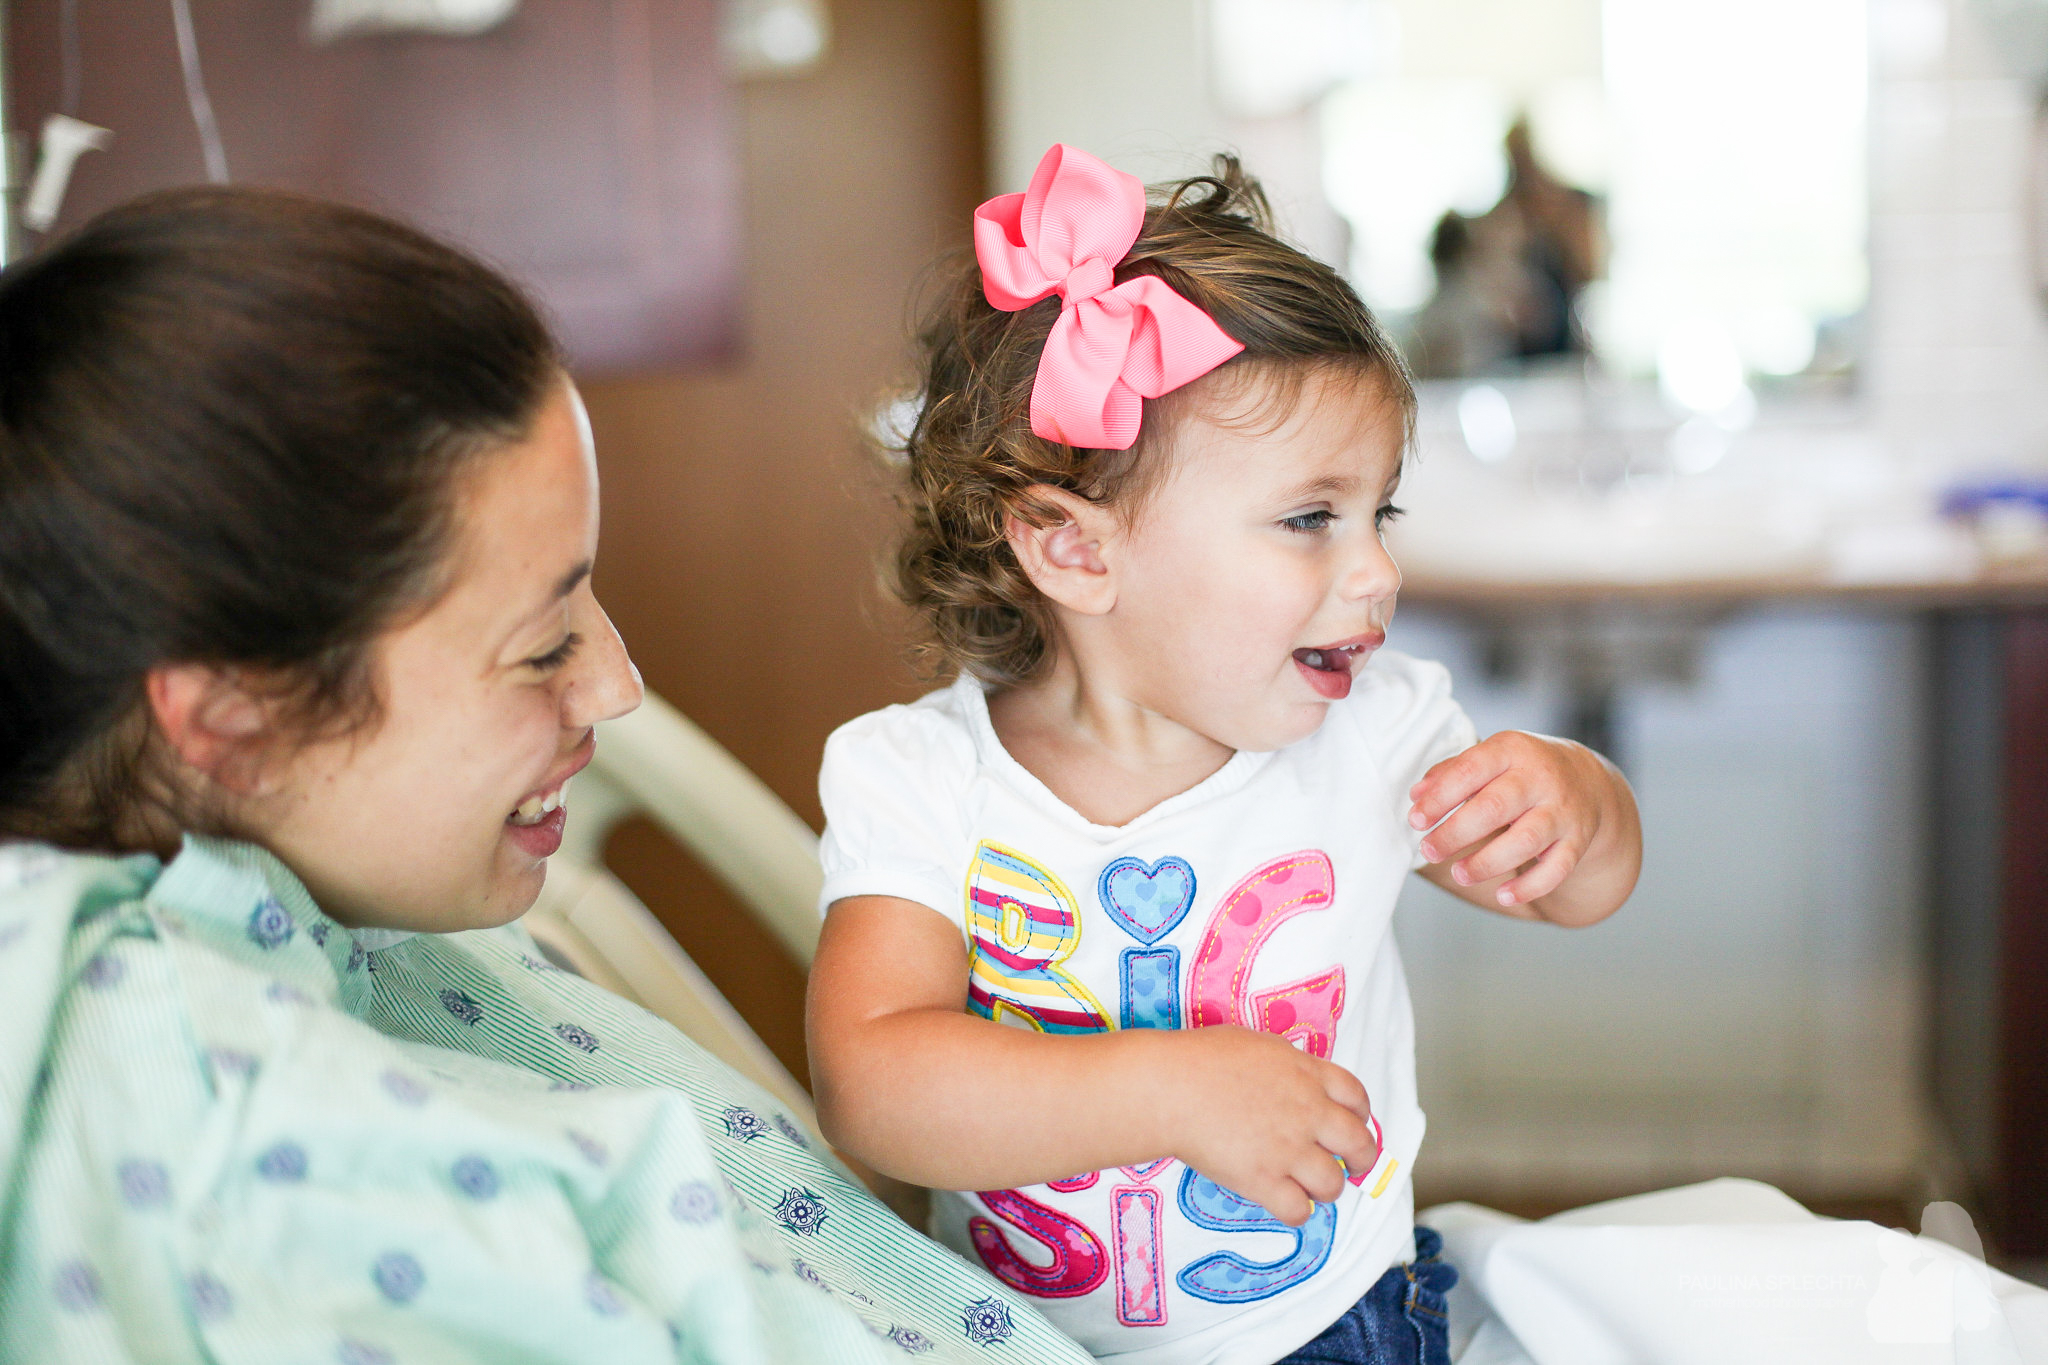 birth-center-hospital-photographer-photography-breastfeeding-south-florida-boca-regional-delray-palms-hollywood-pumping-water-natural-family-newborn-37.jpg